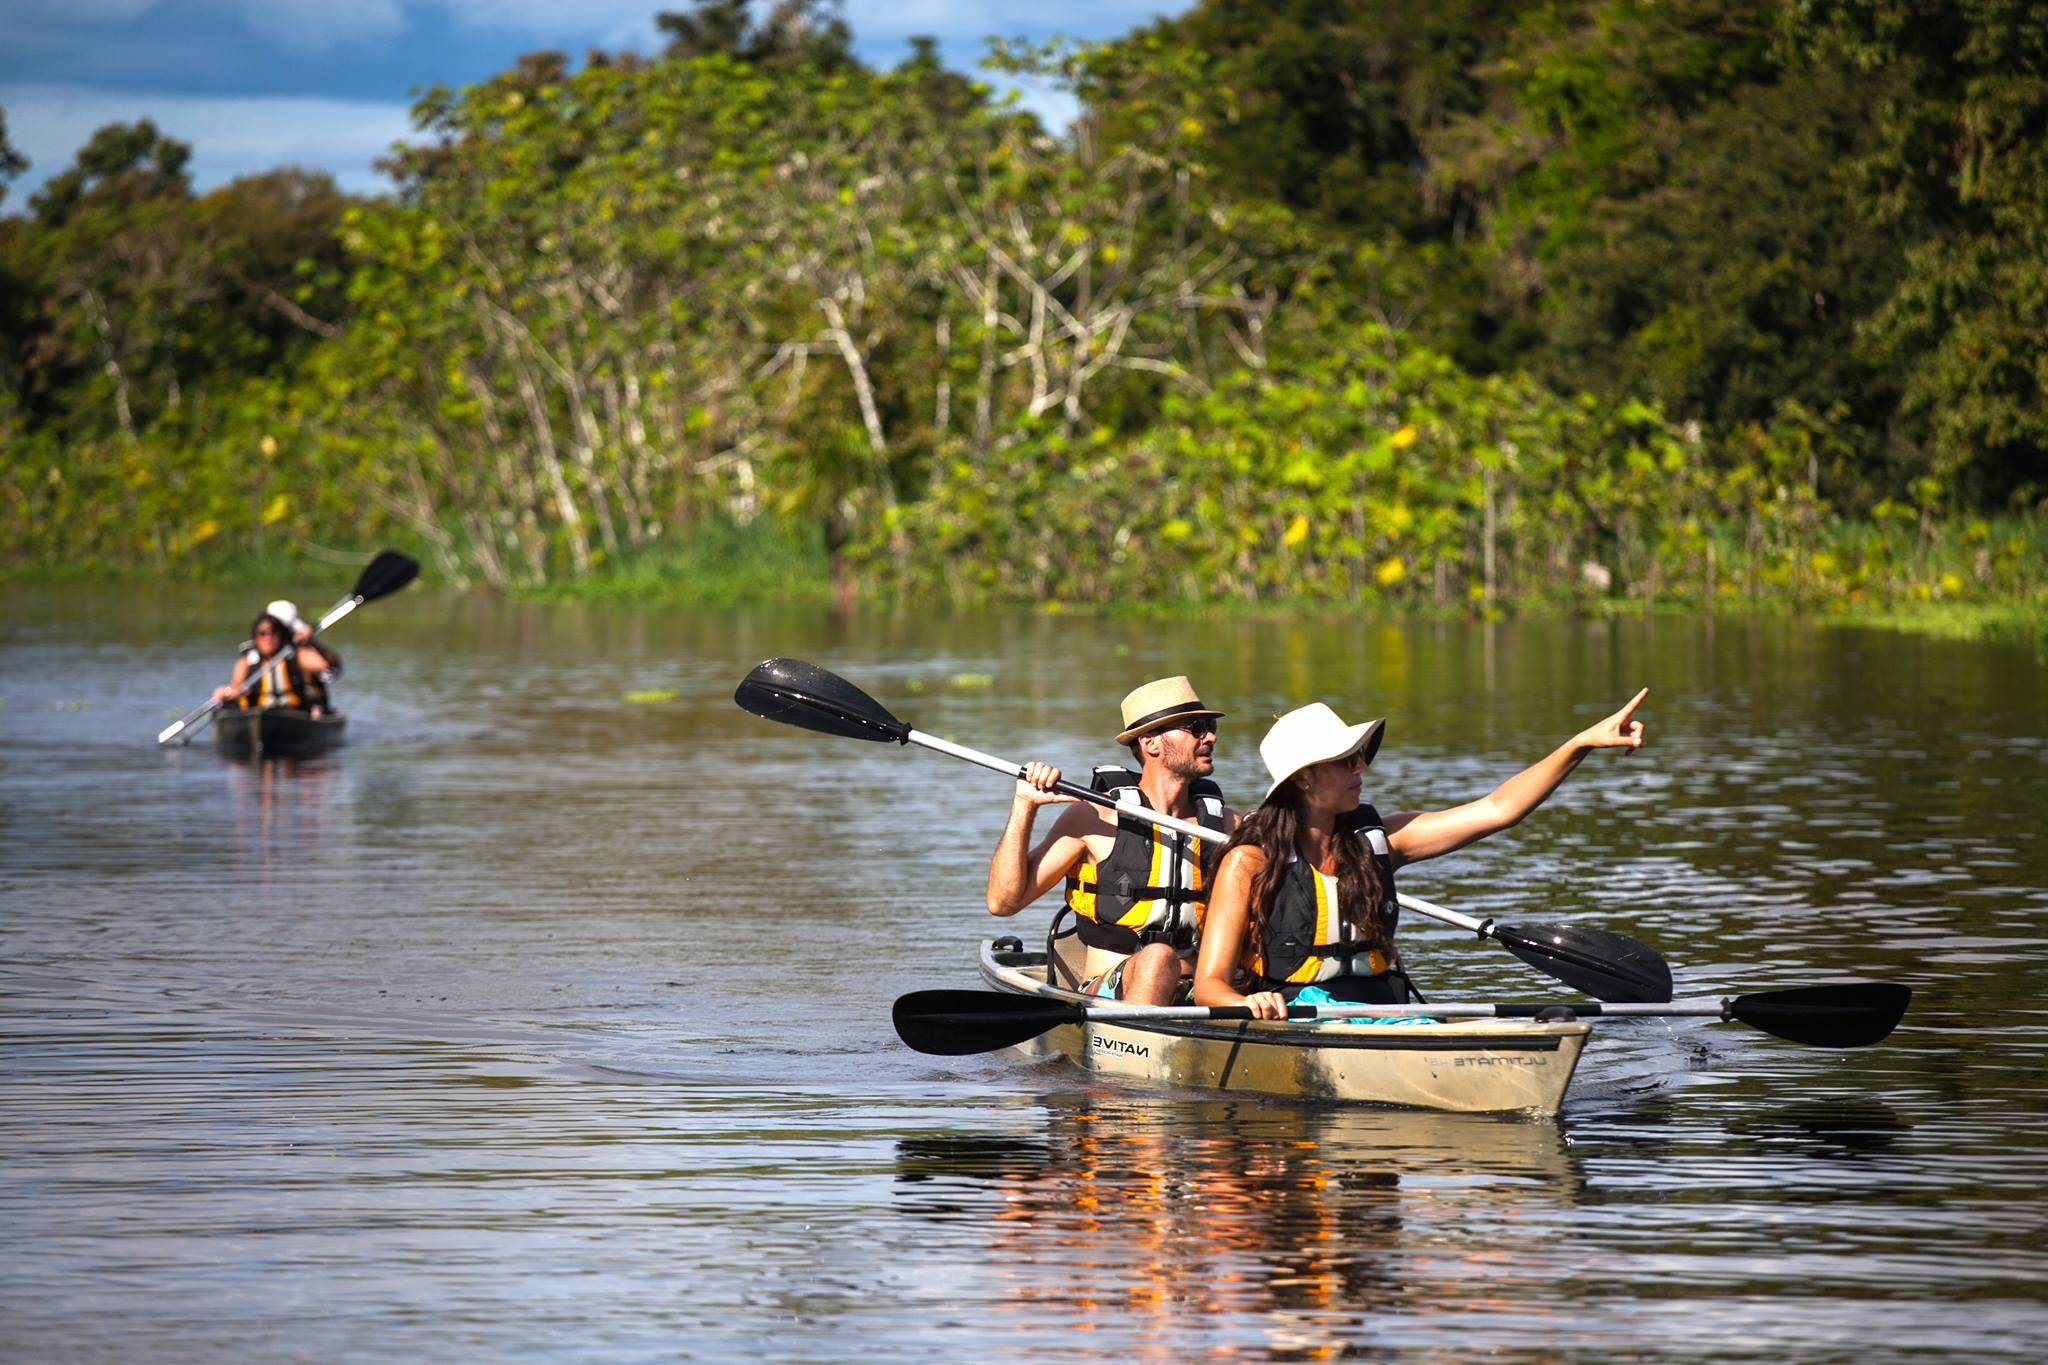 Kayaking in the Amazon jungle (Delfin Amazon Cruise excursion).